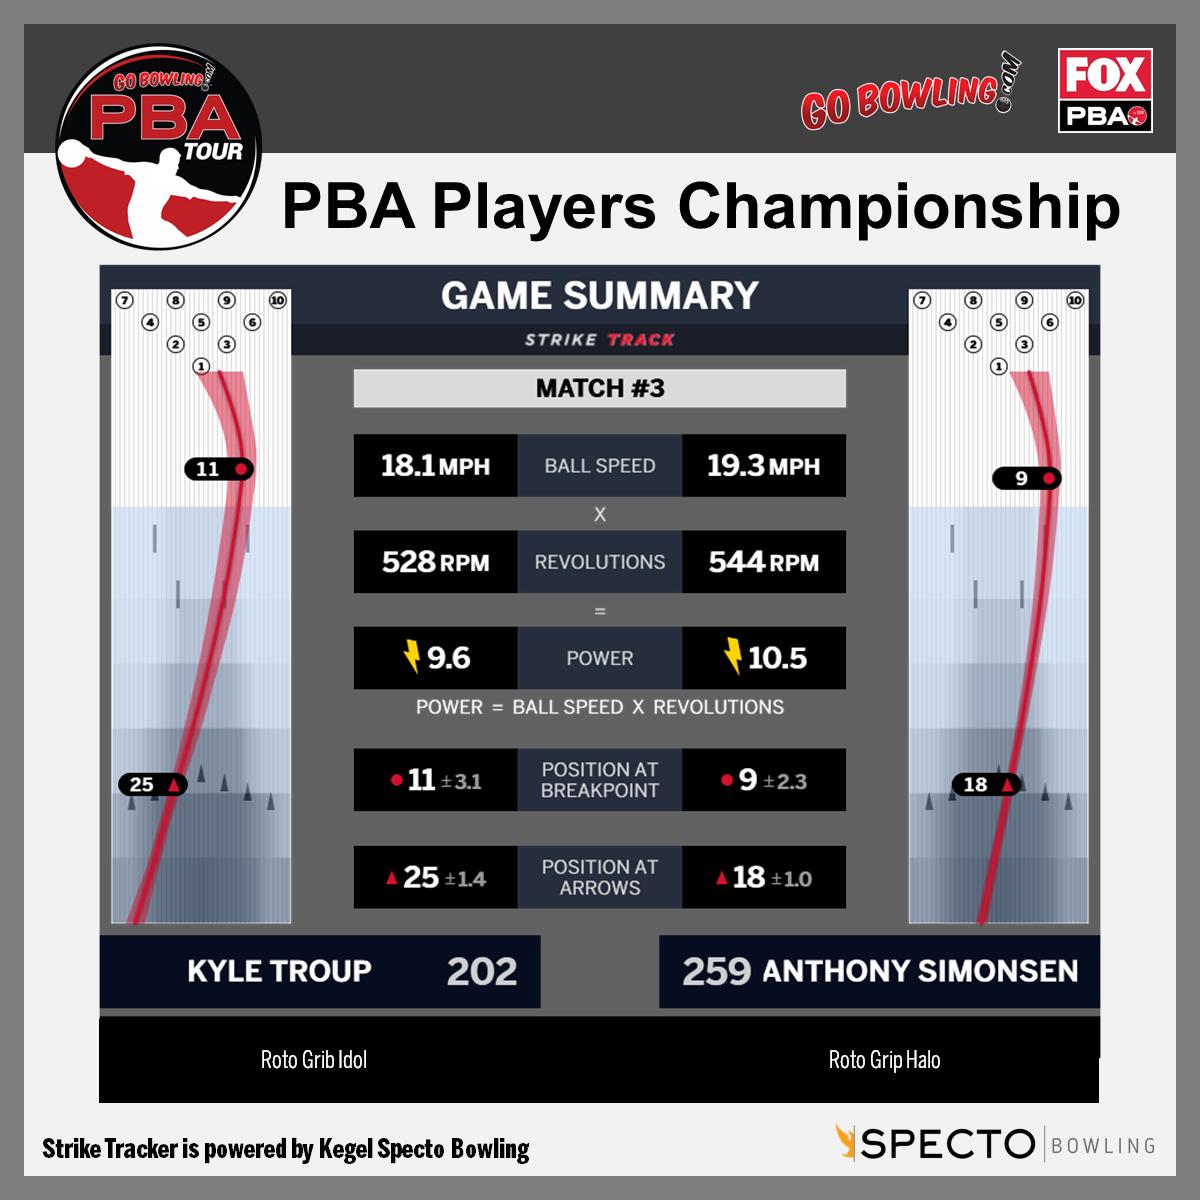 PBA Players Championship